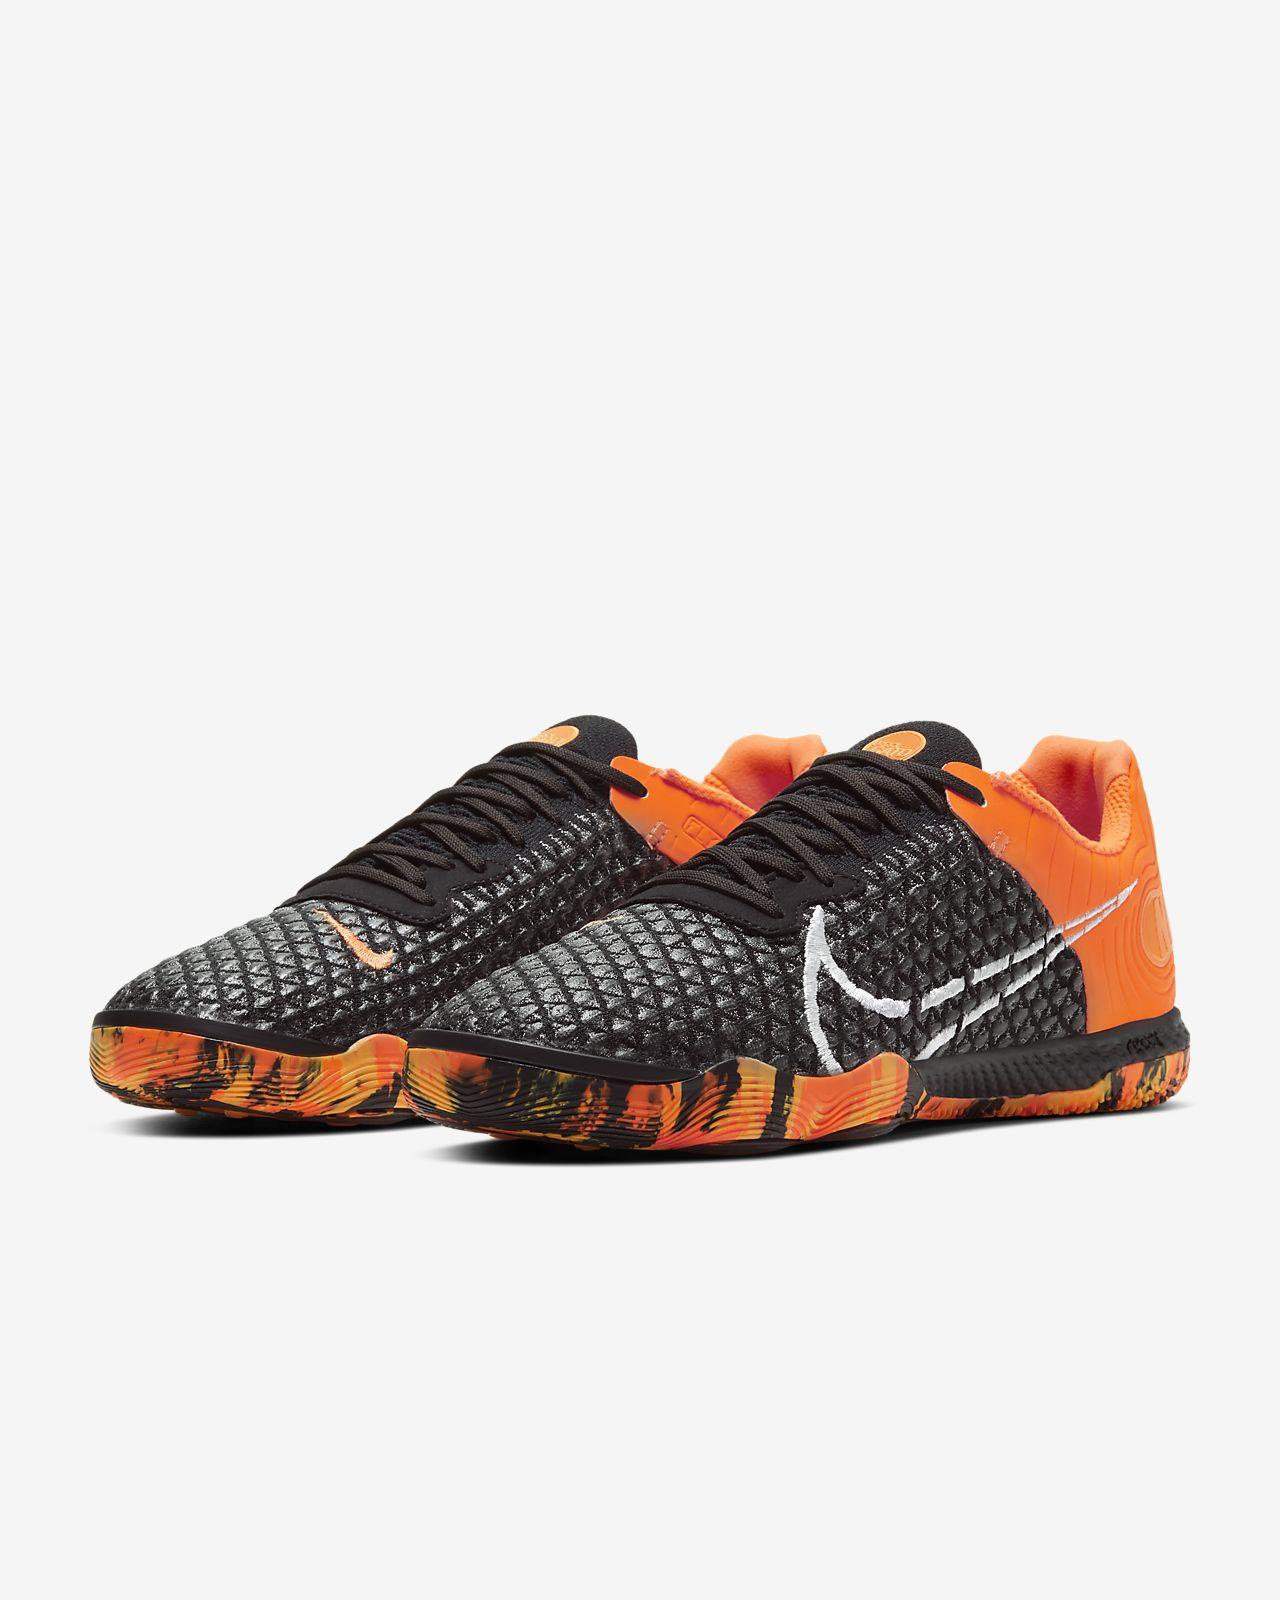 Sapatilhas de futsal Nike React Gato